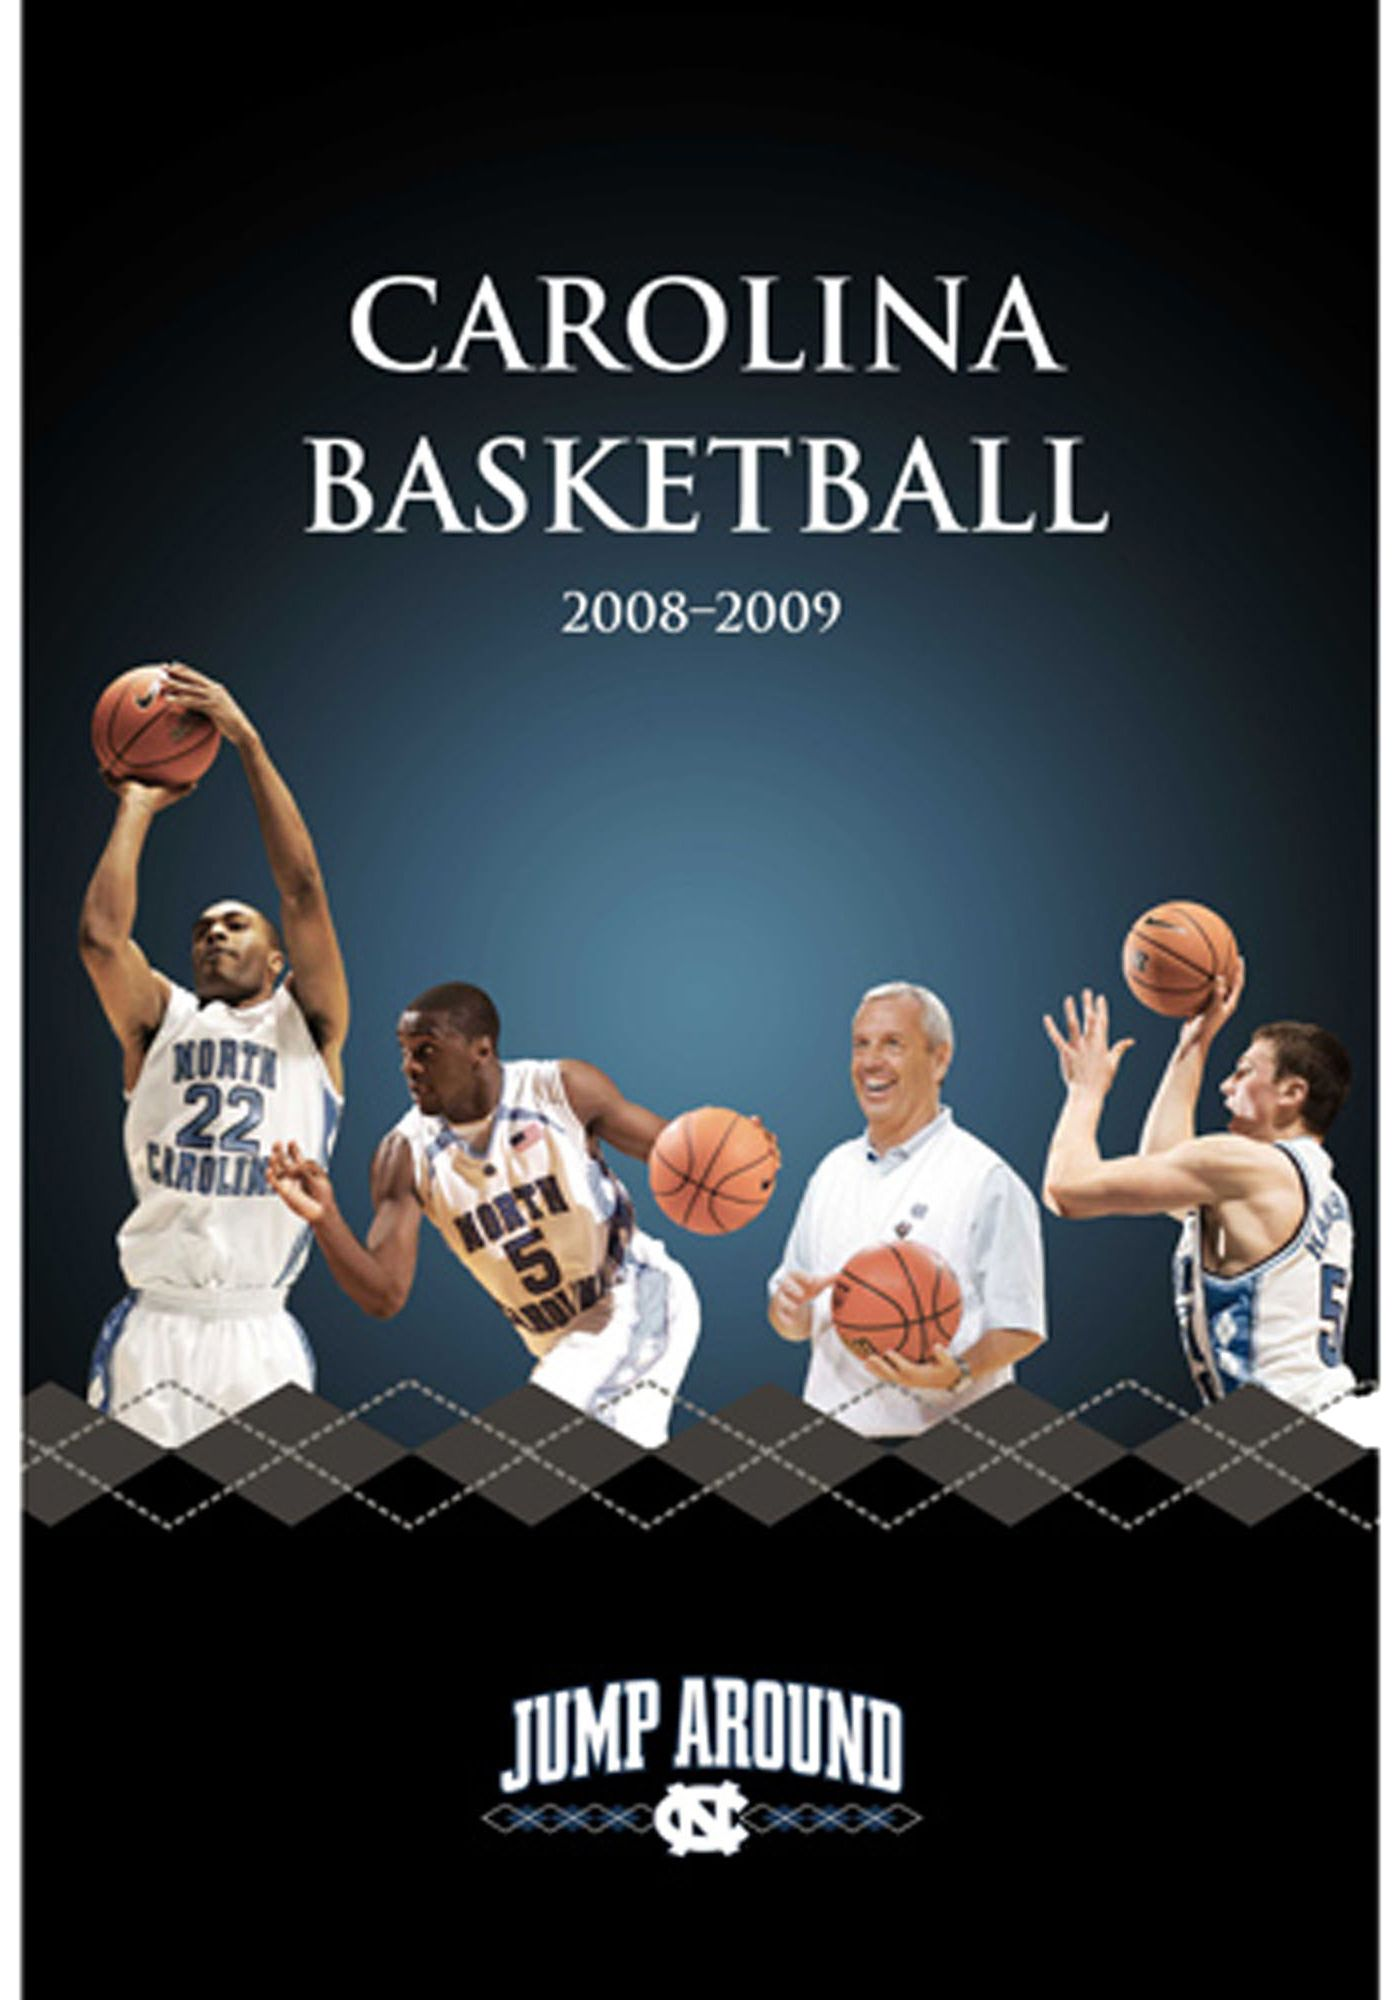 North Carolina Basketball: 2008-2009 Season in Review Highlight DVD